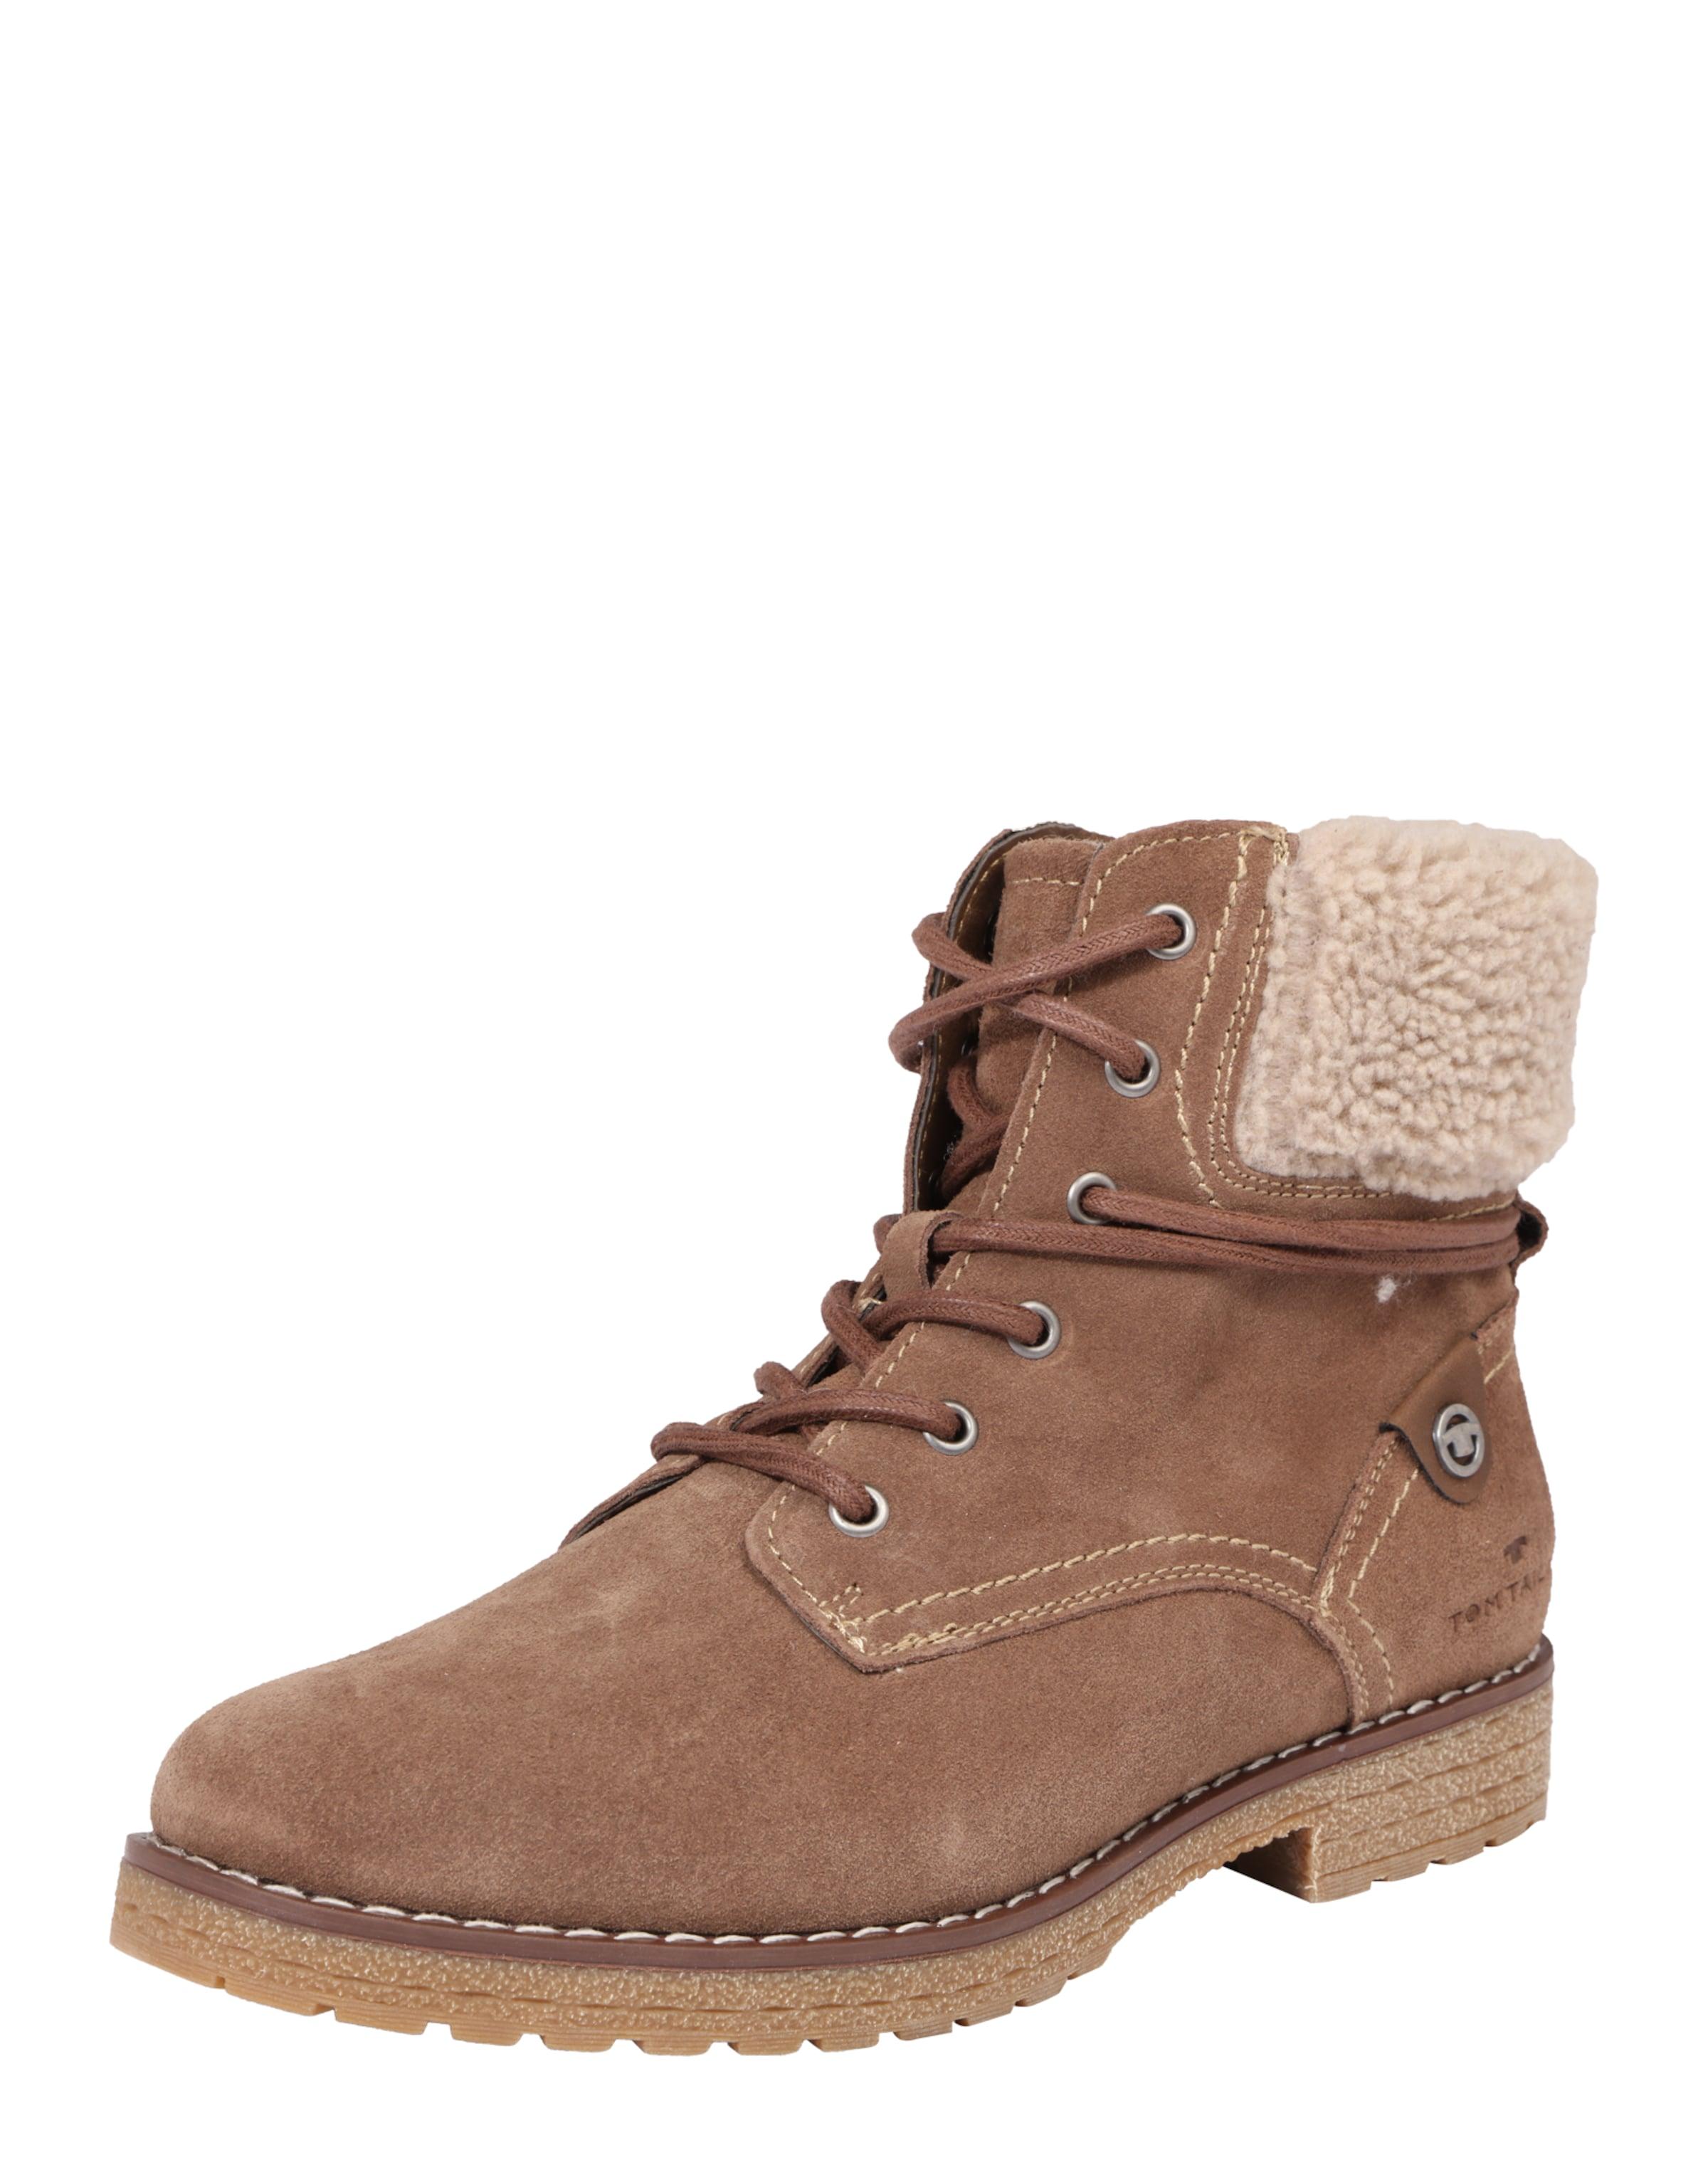 Haltbare TAILOR Mode billige Schuhe TOM TAILOR Haltbare | Stiefelette Schuhe Gut getragene Schuhe 55b078